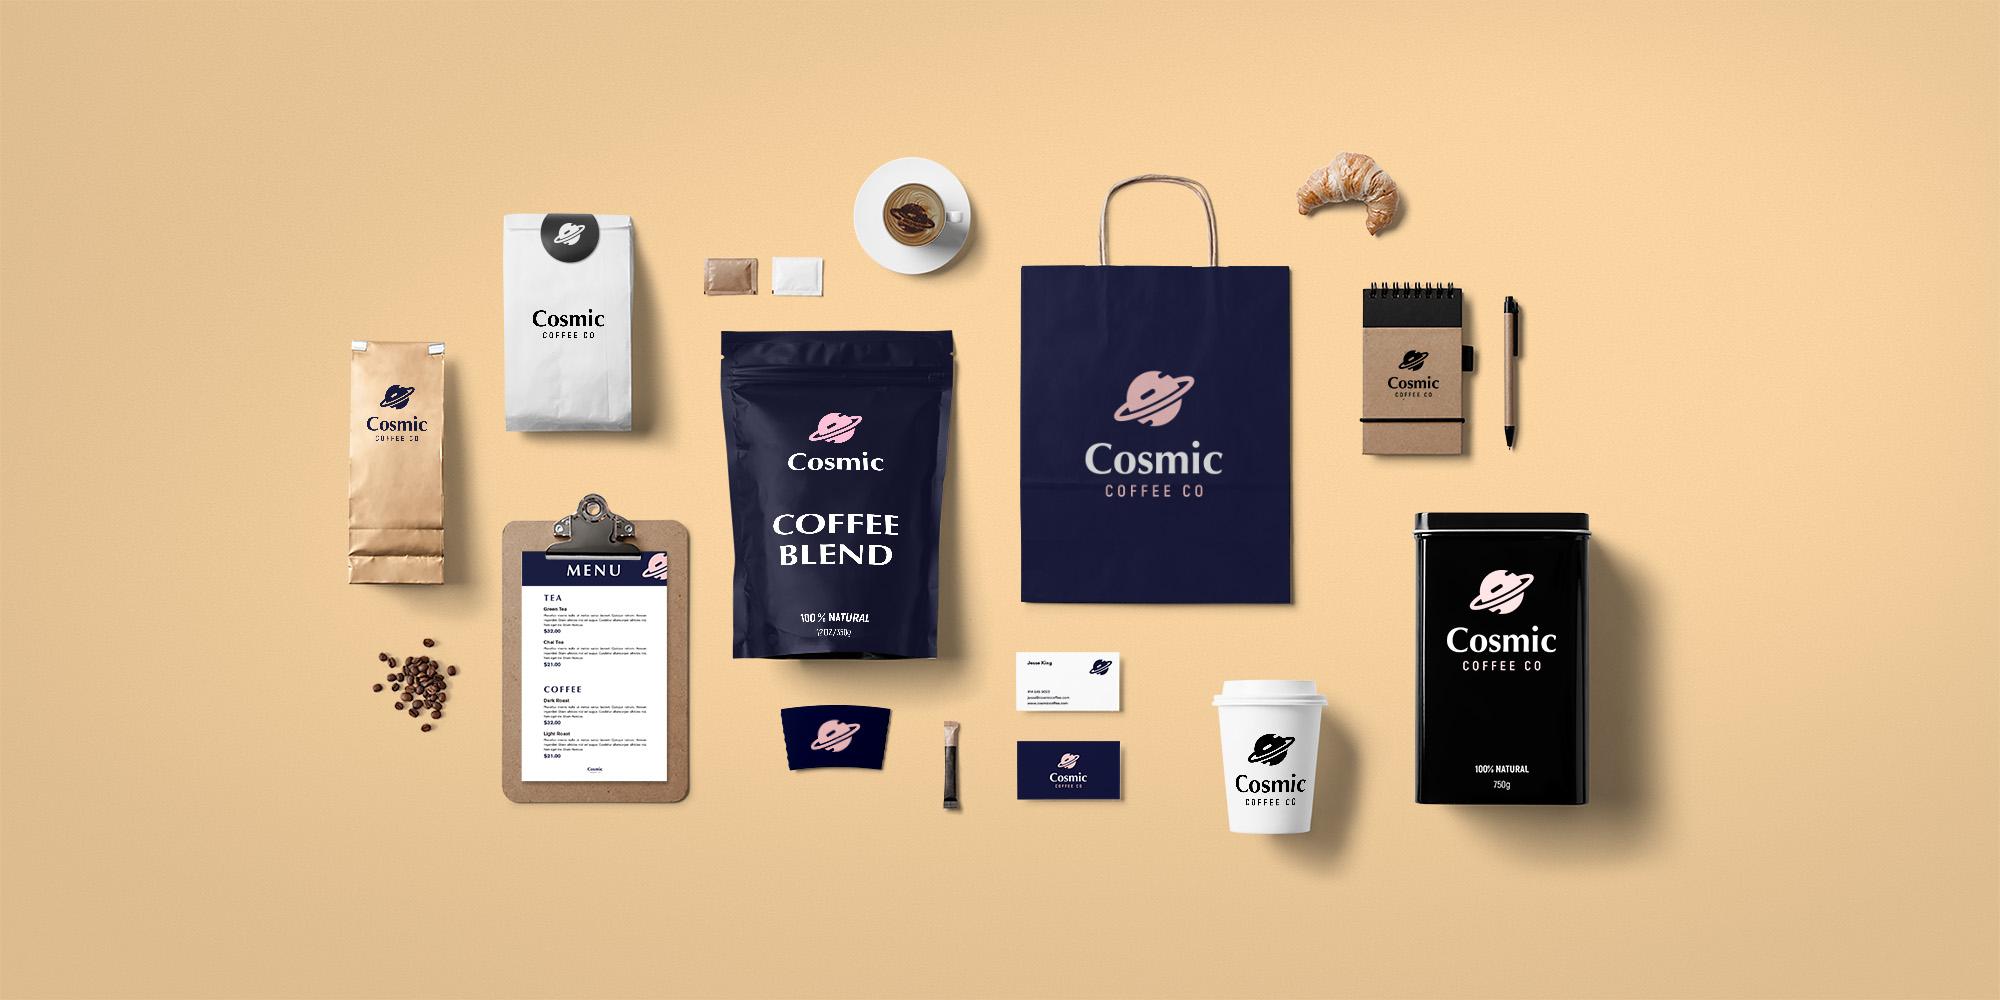 cosmic_coffee_scene_4.jpg